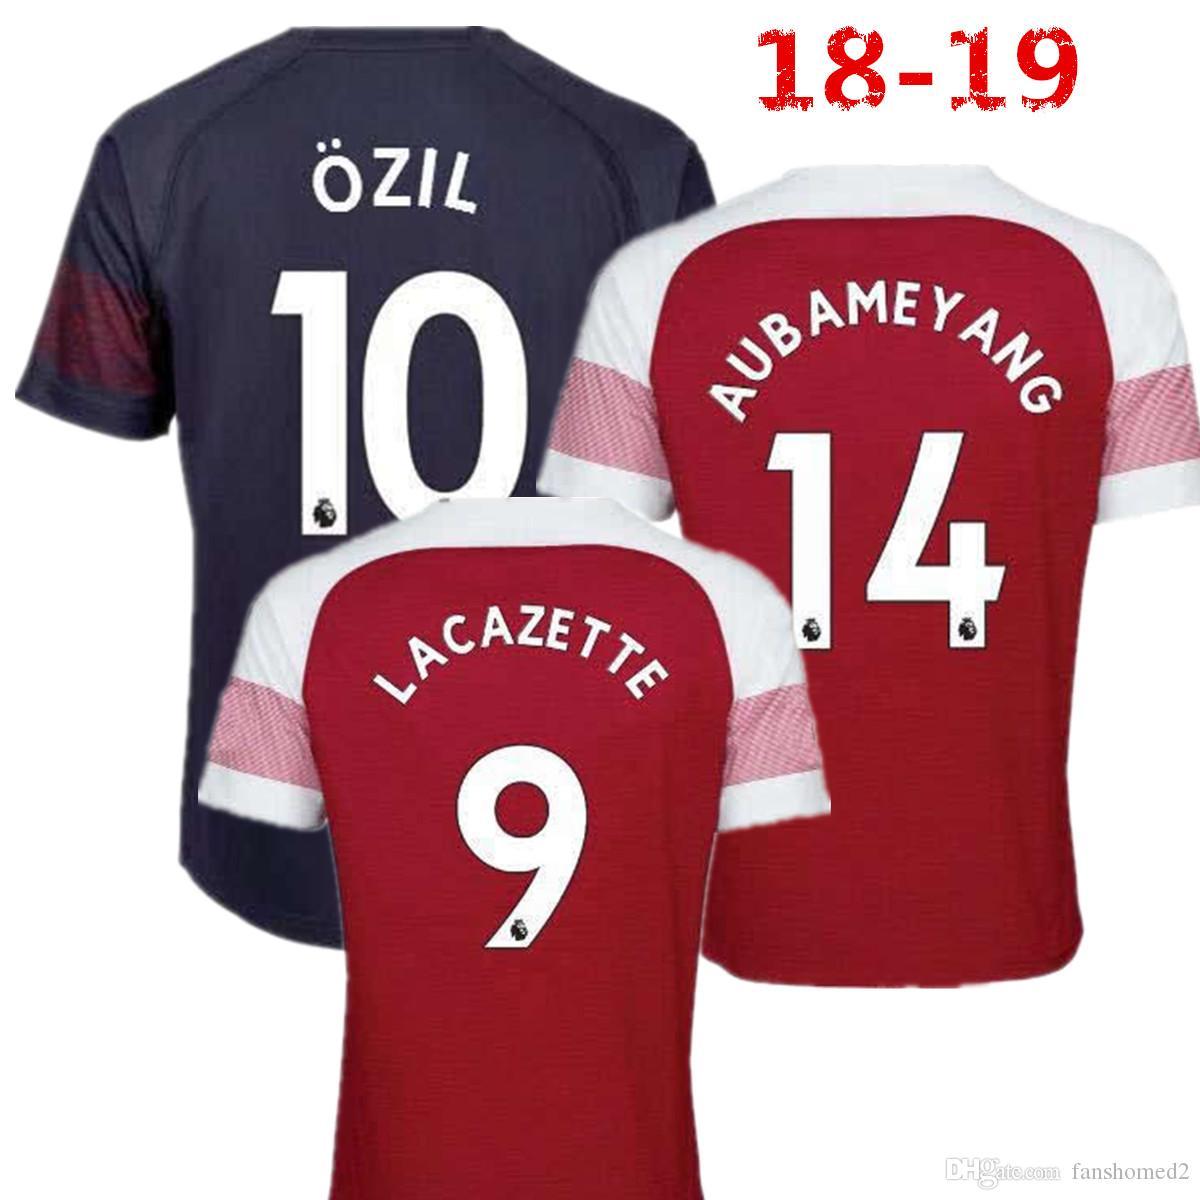 a2b07dae048 2018 Arsenal Gunners Away  10 OZIL AUBAMEYANG Soccer Jersey 18 19 ...